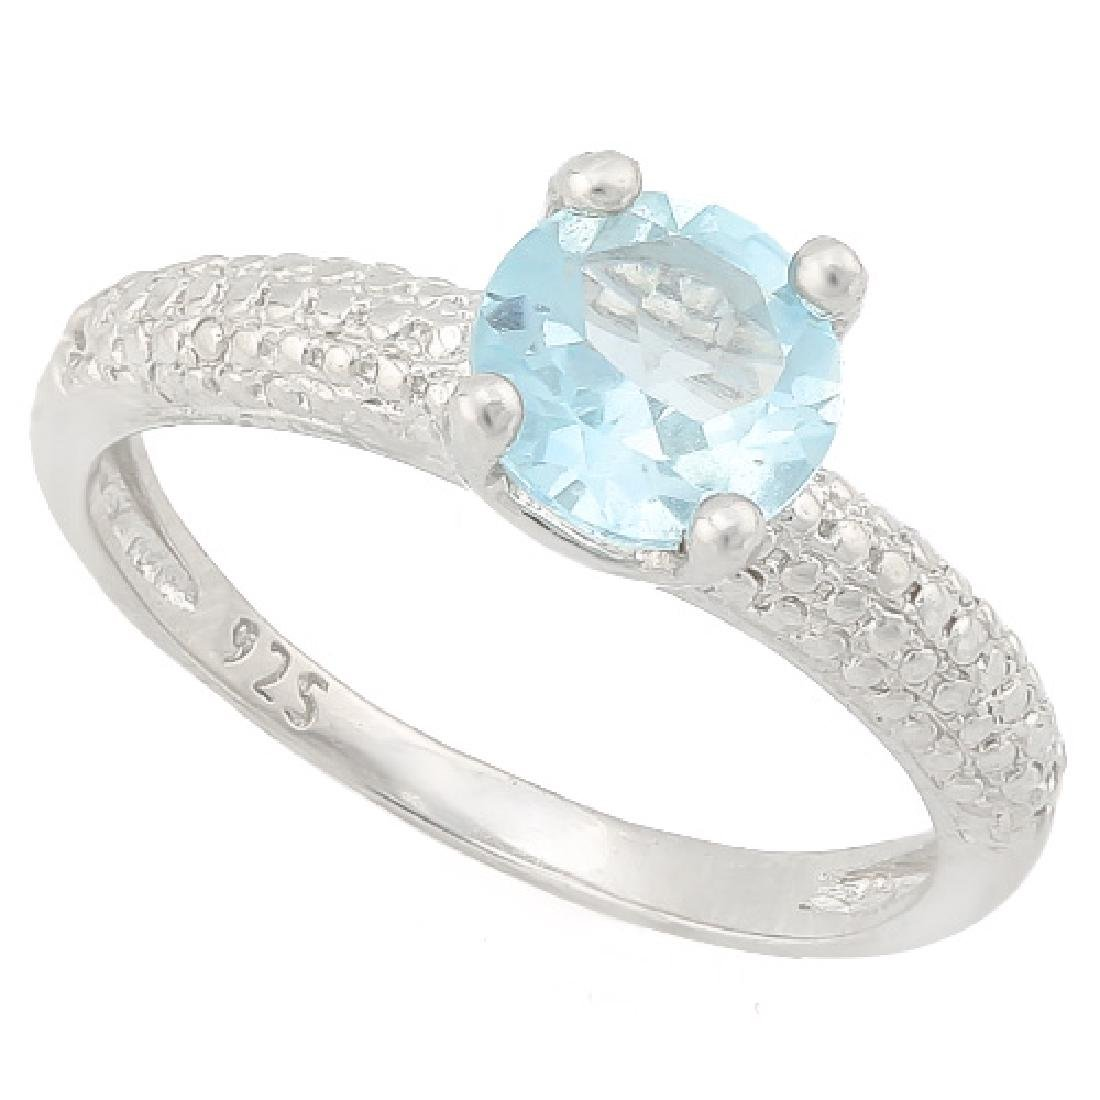 1 1/2 CARAT BABY SWISS BLUE TOPAZ & DIAMOND 925 STERLIN